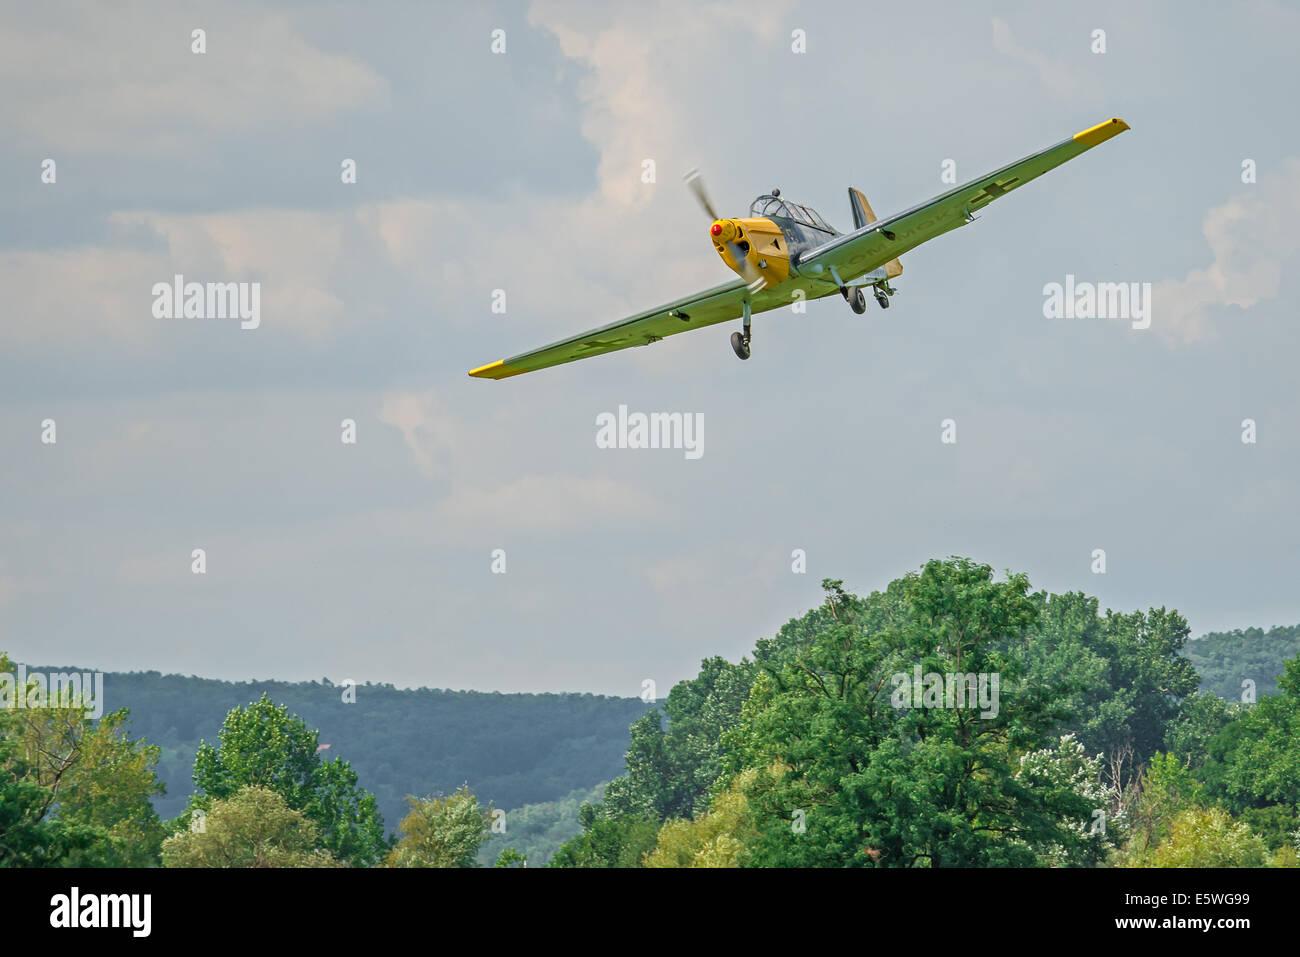 Historic german bomber Zlin 205 approaching the battlefield during reenactment of World War II fights - Stock Image